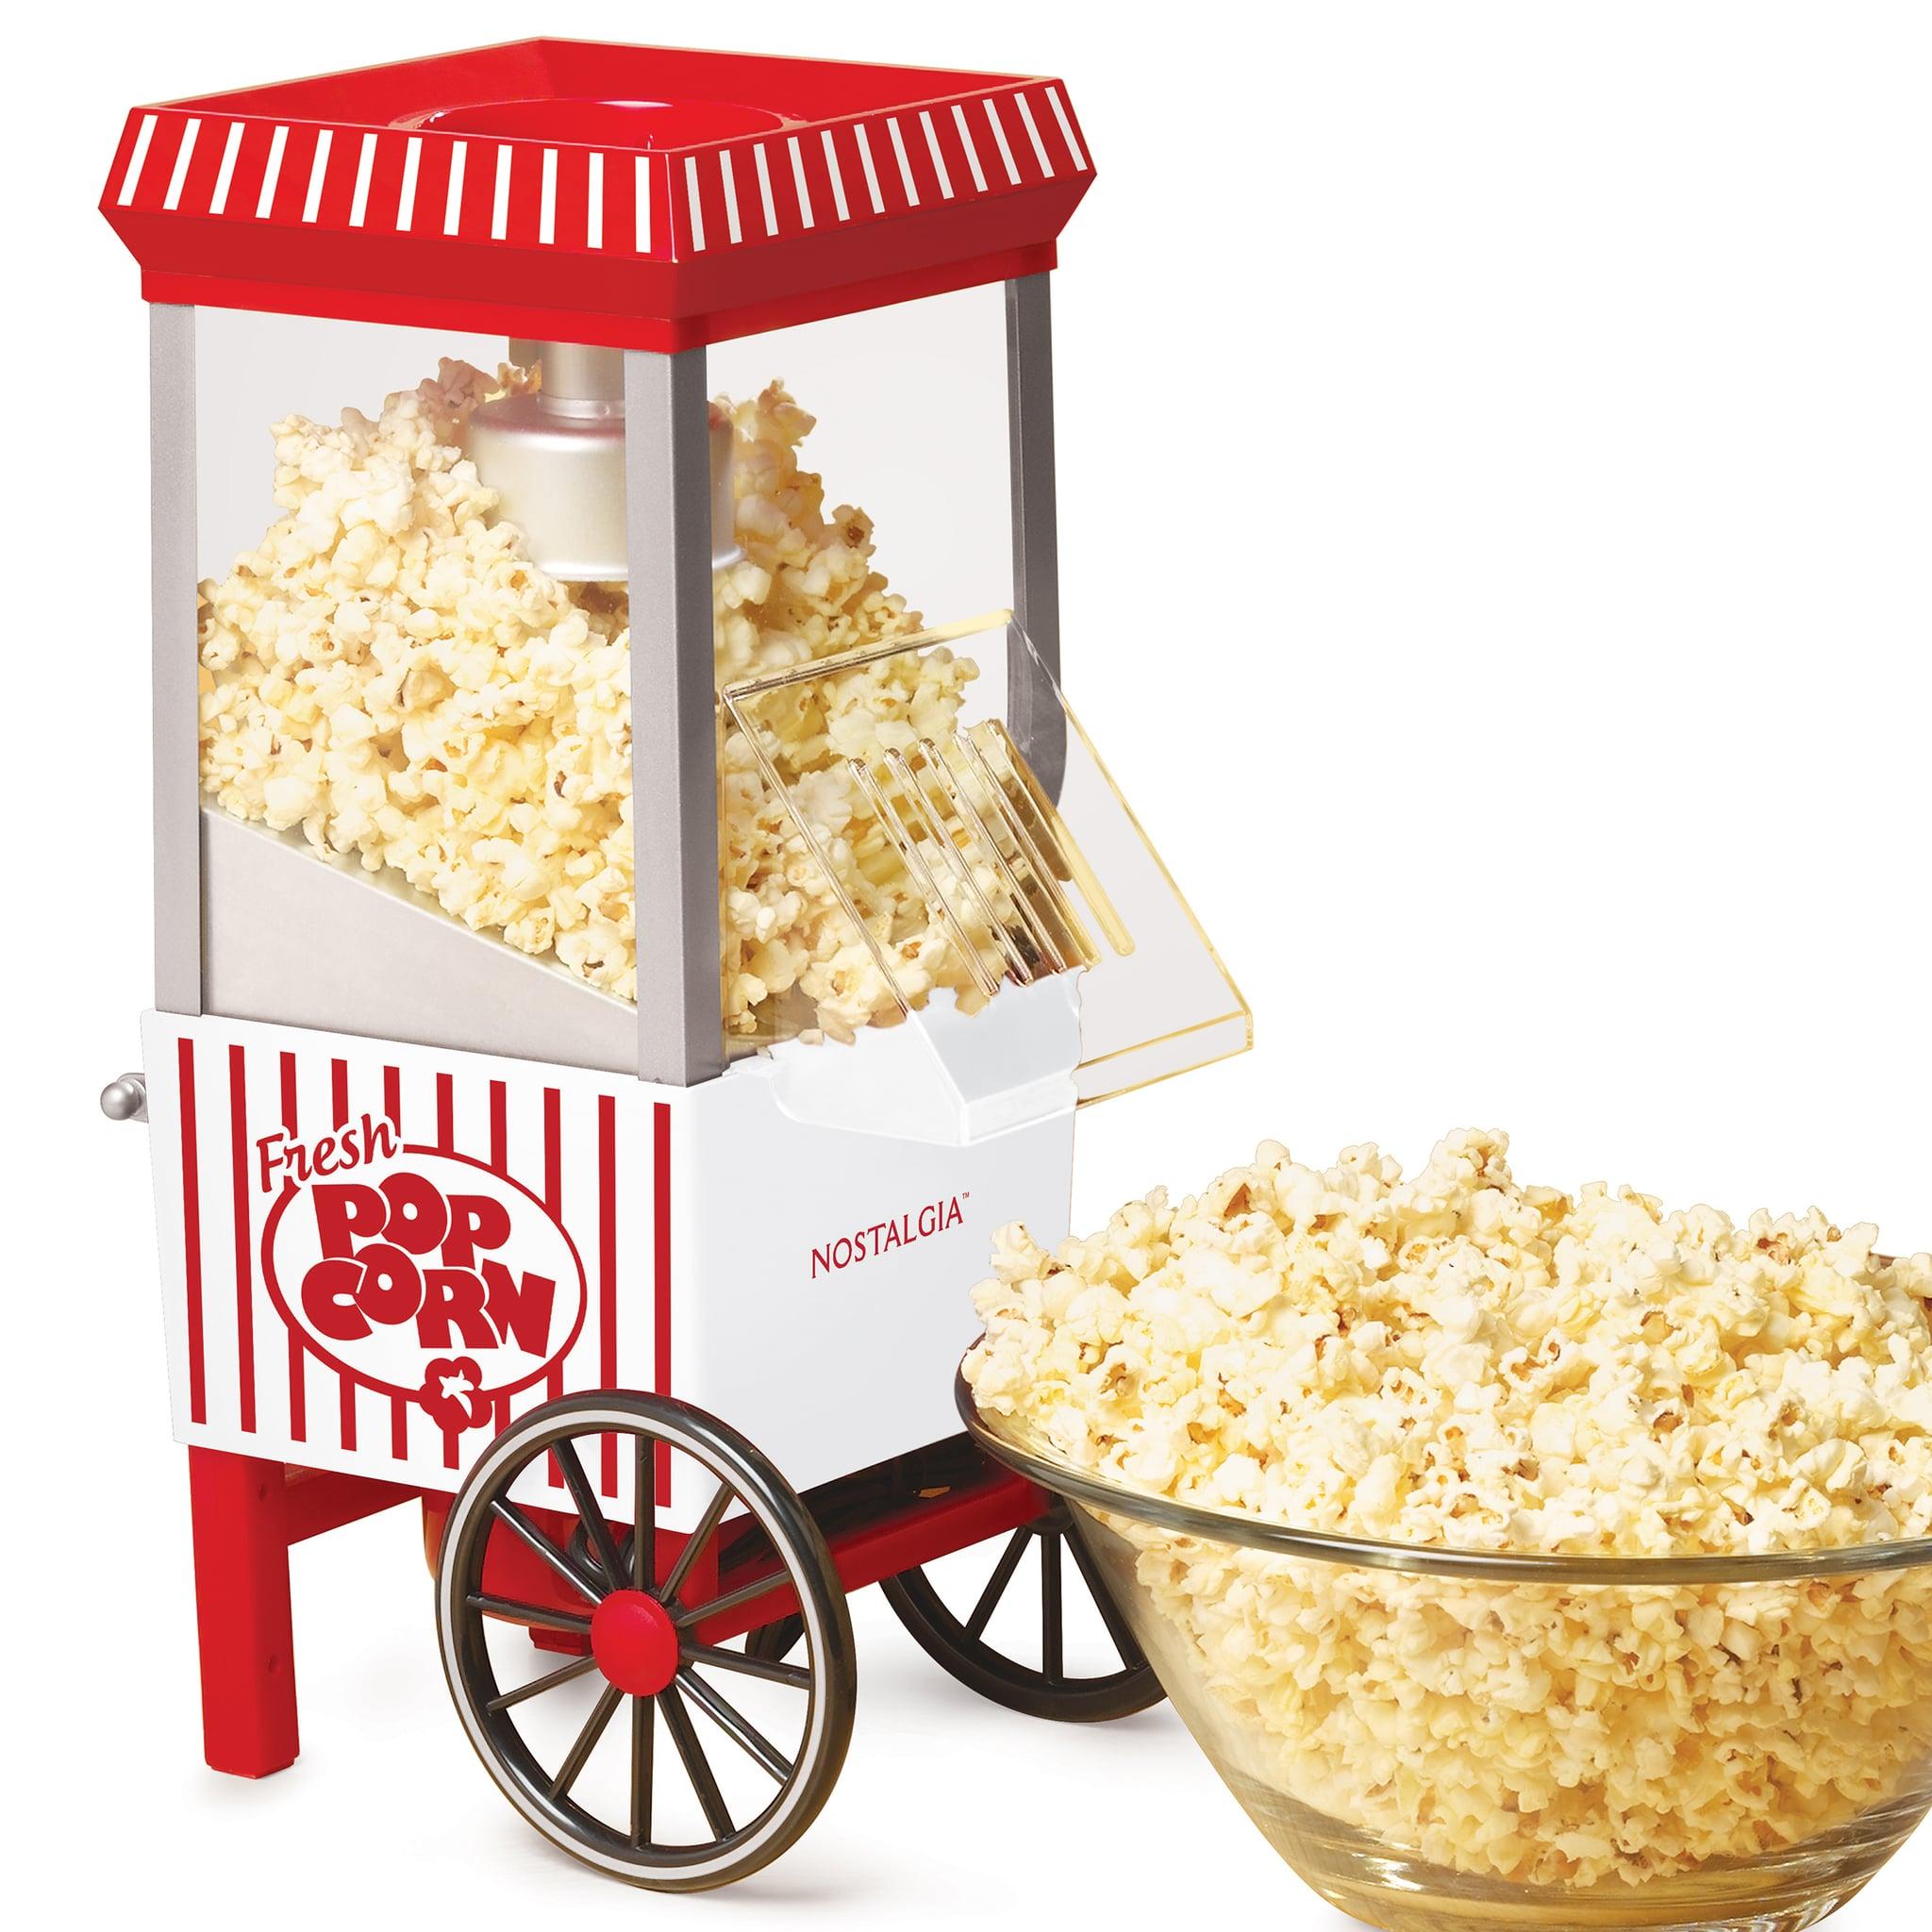 Nostalgia Hot Air Popcorn Maker 50 White Elephant Gifts That Ll